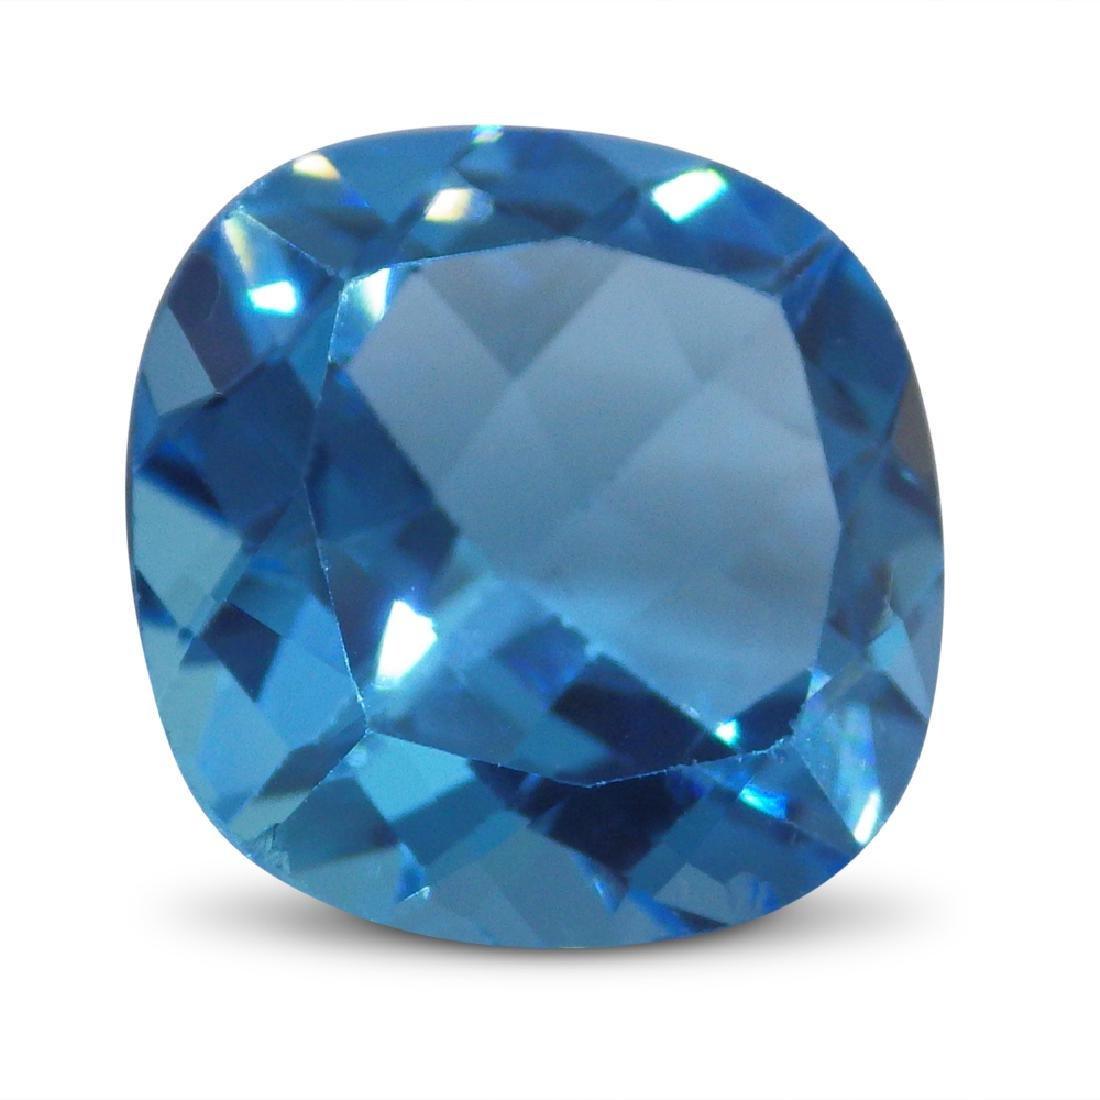 15.13 Carat Loose Cushion Blue Topaz